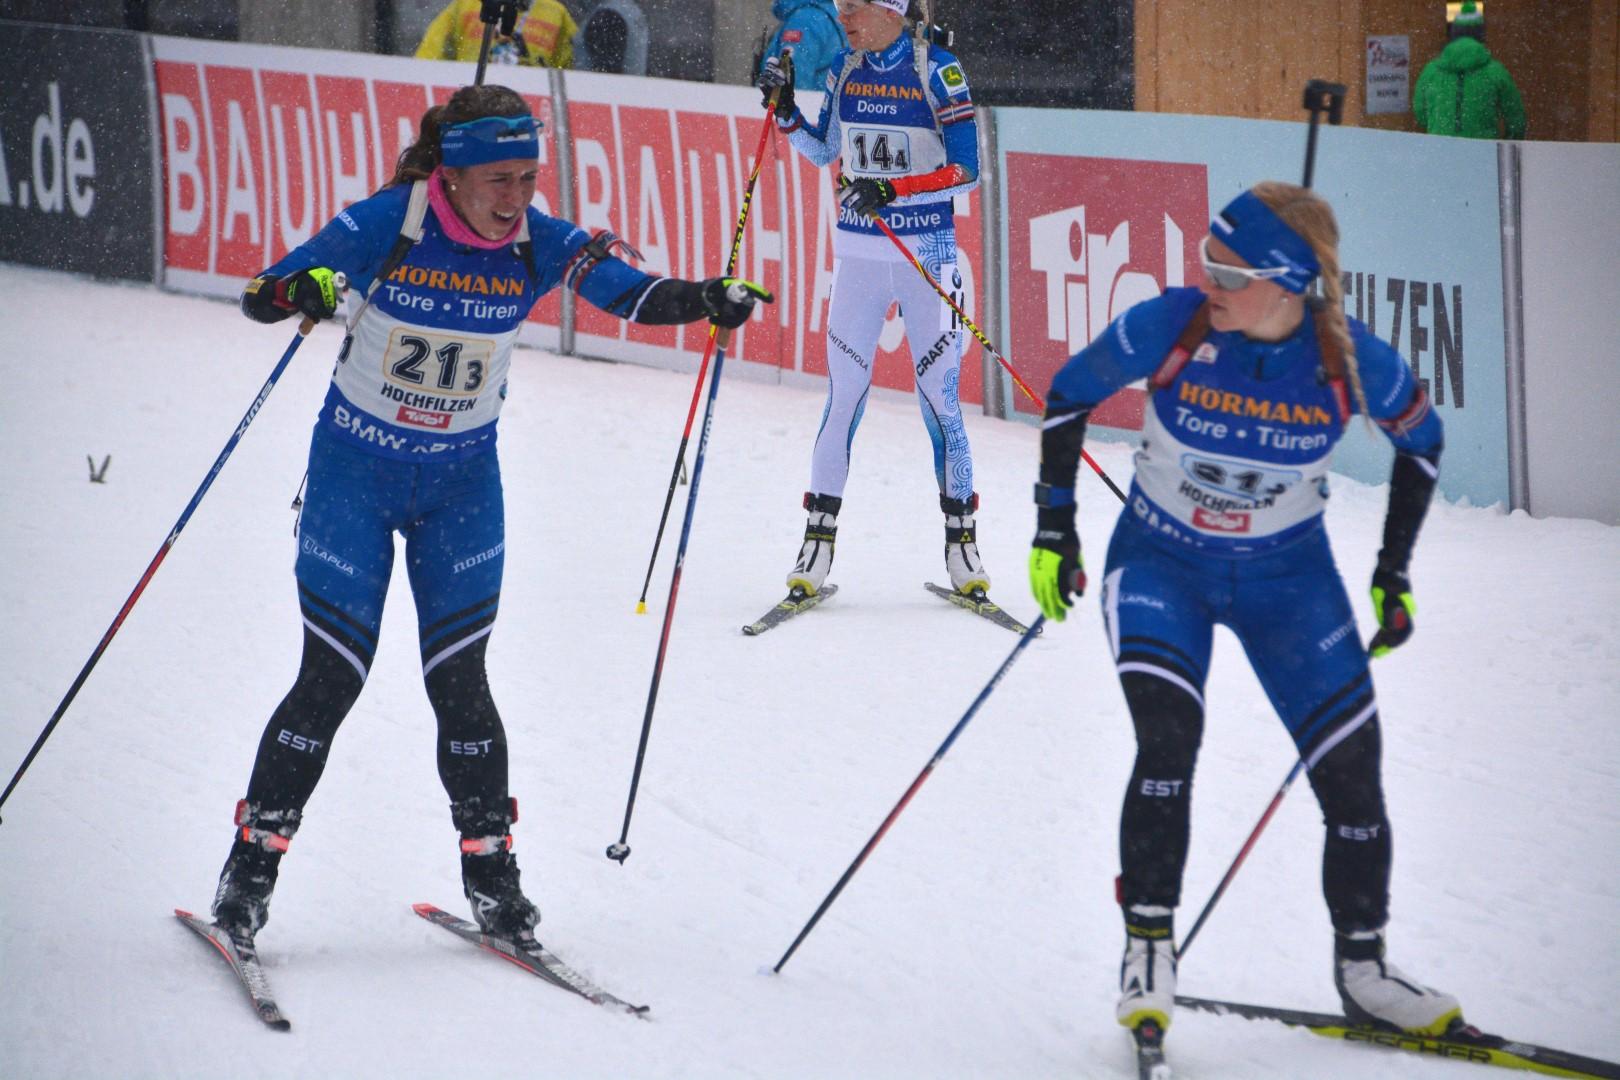 dbefc ski DSC 2495 Large